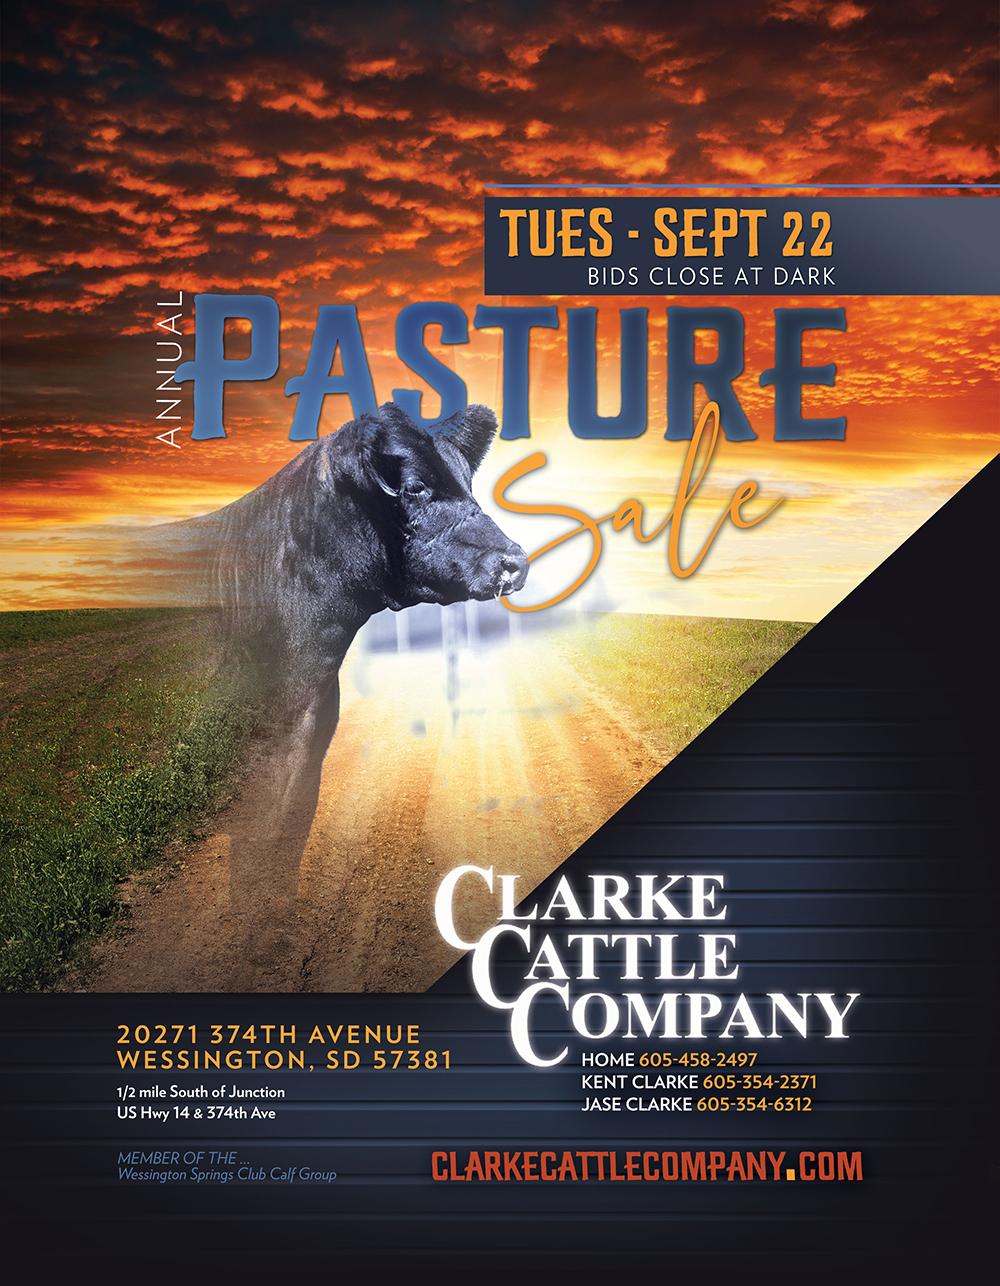 Clarke Cattle Co 2020 Ad